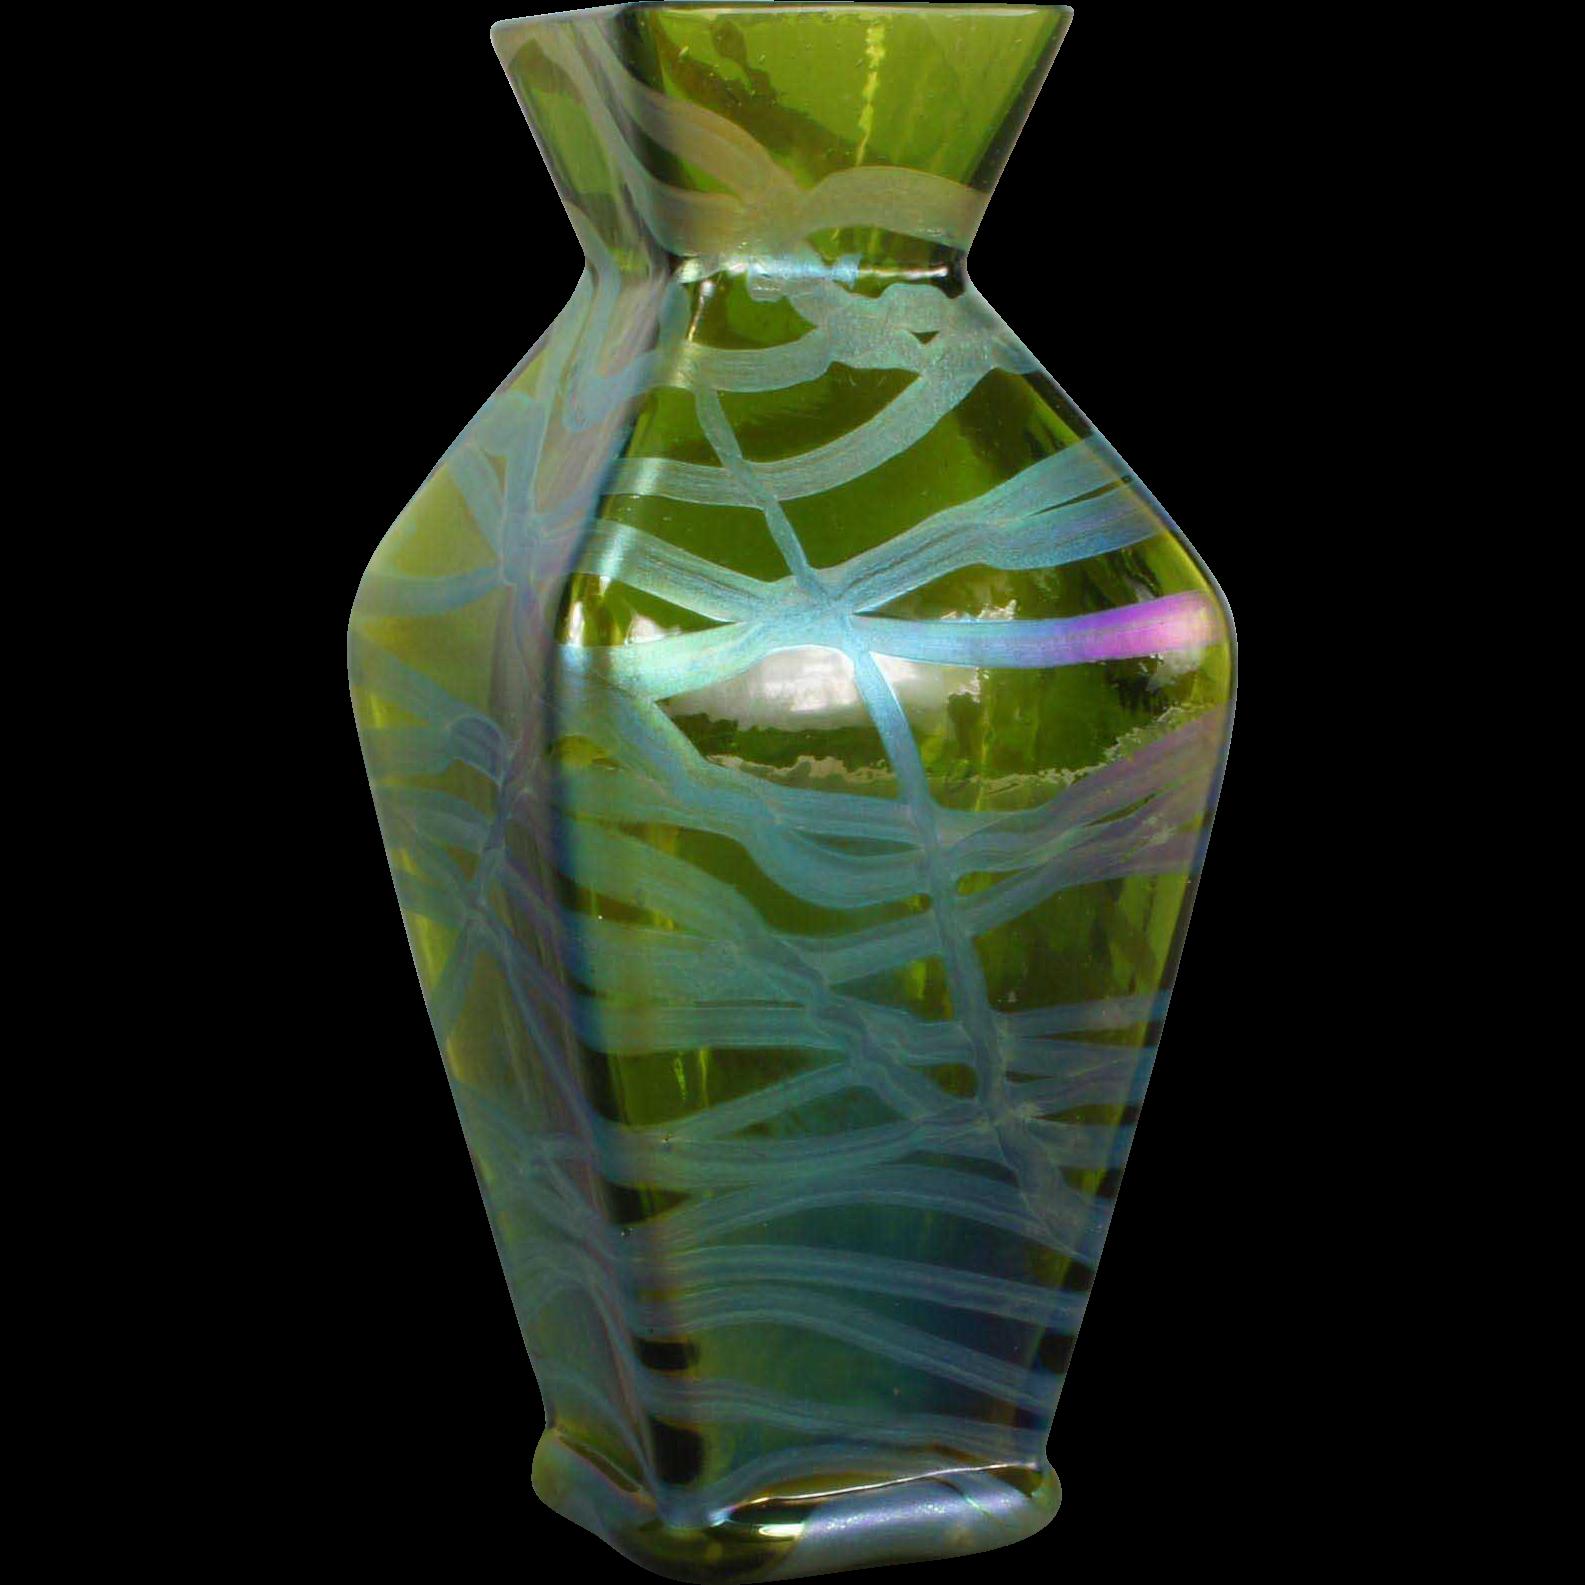 Rare Kralik Banded Iridescent Vase Loetz Era Glasscollector Ruby Lane